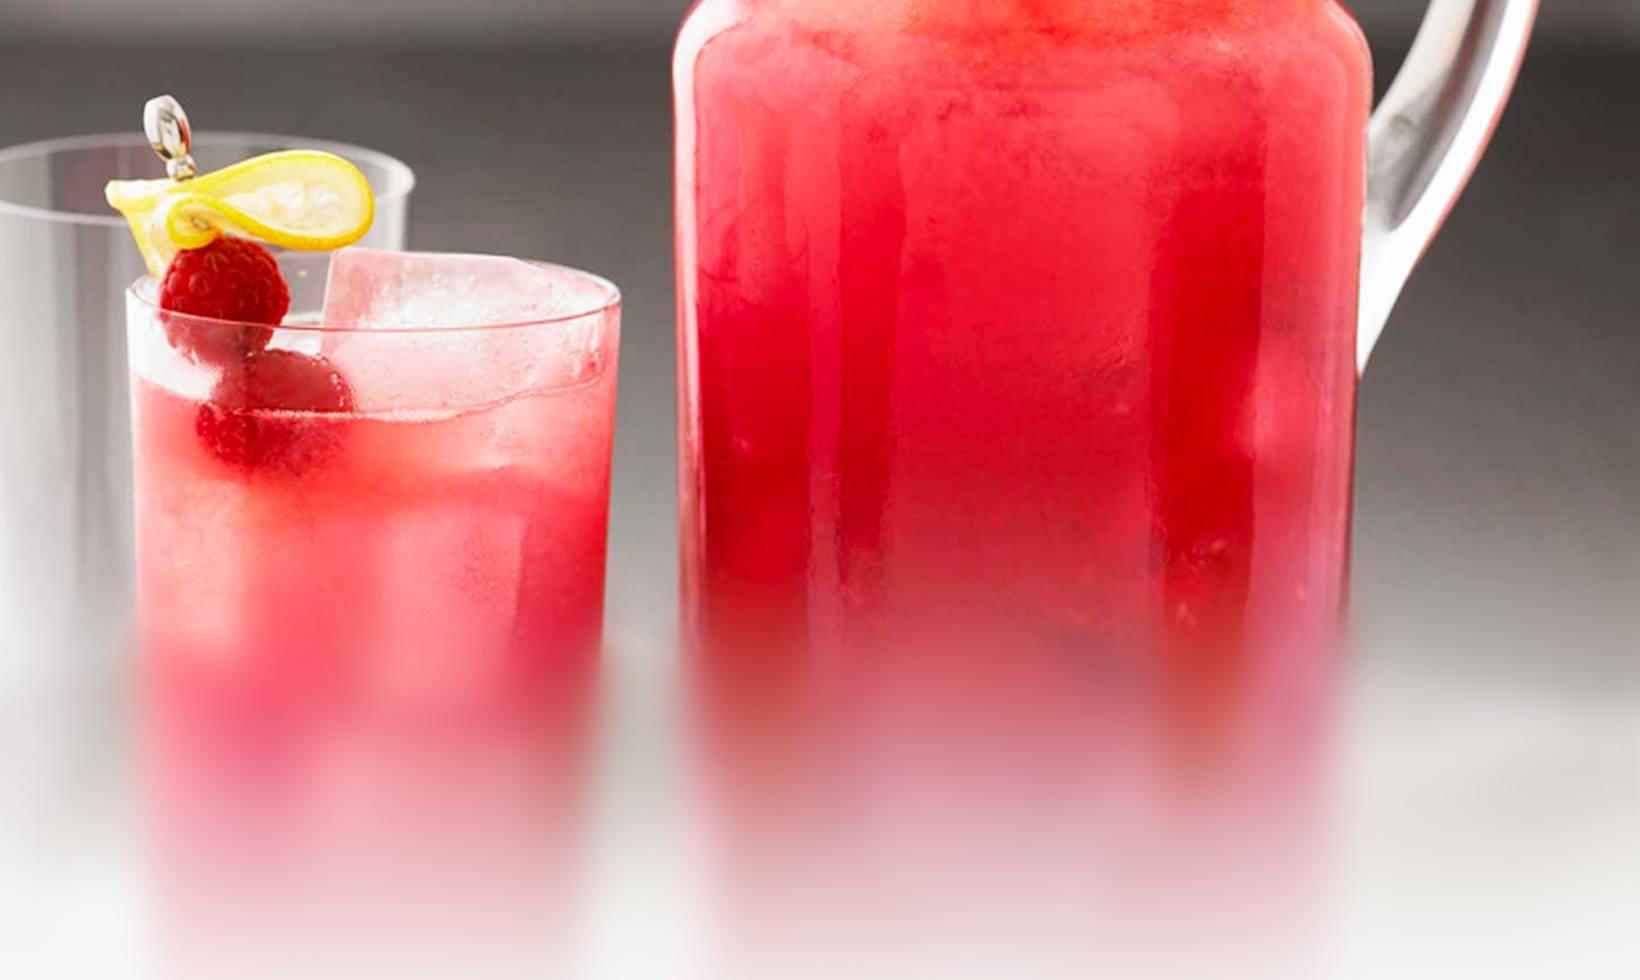 Berry Lemonade Jug